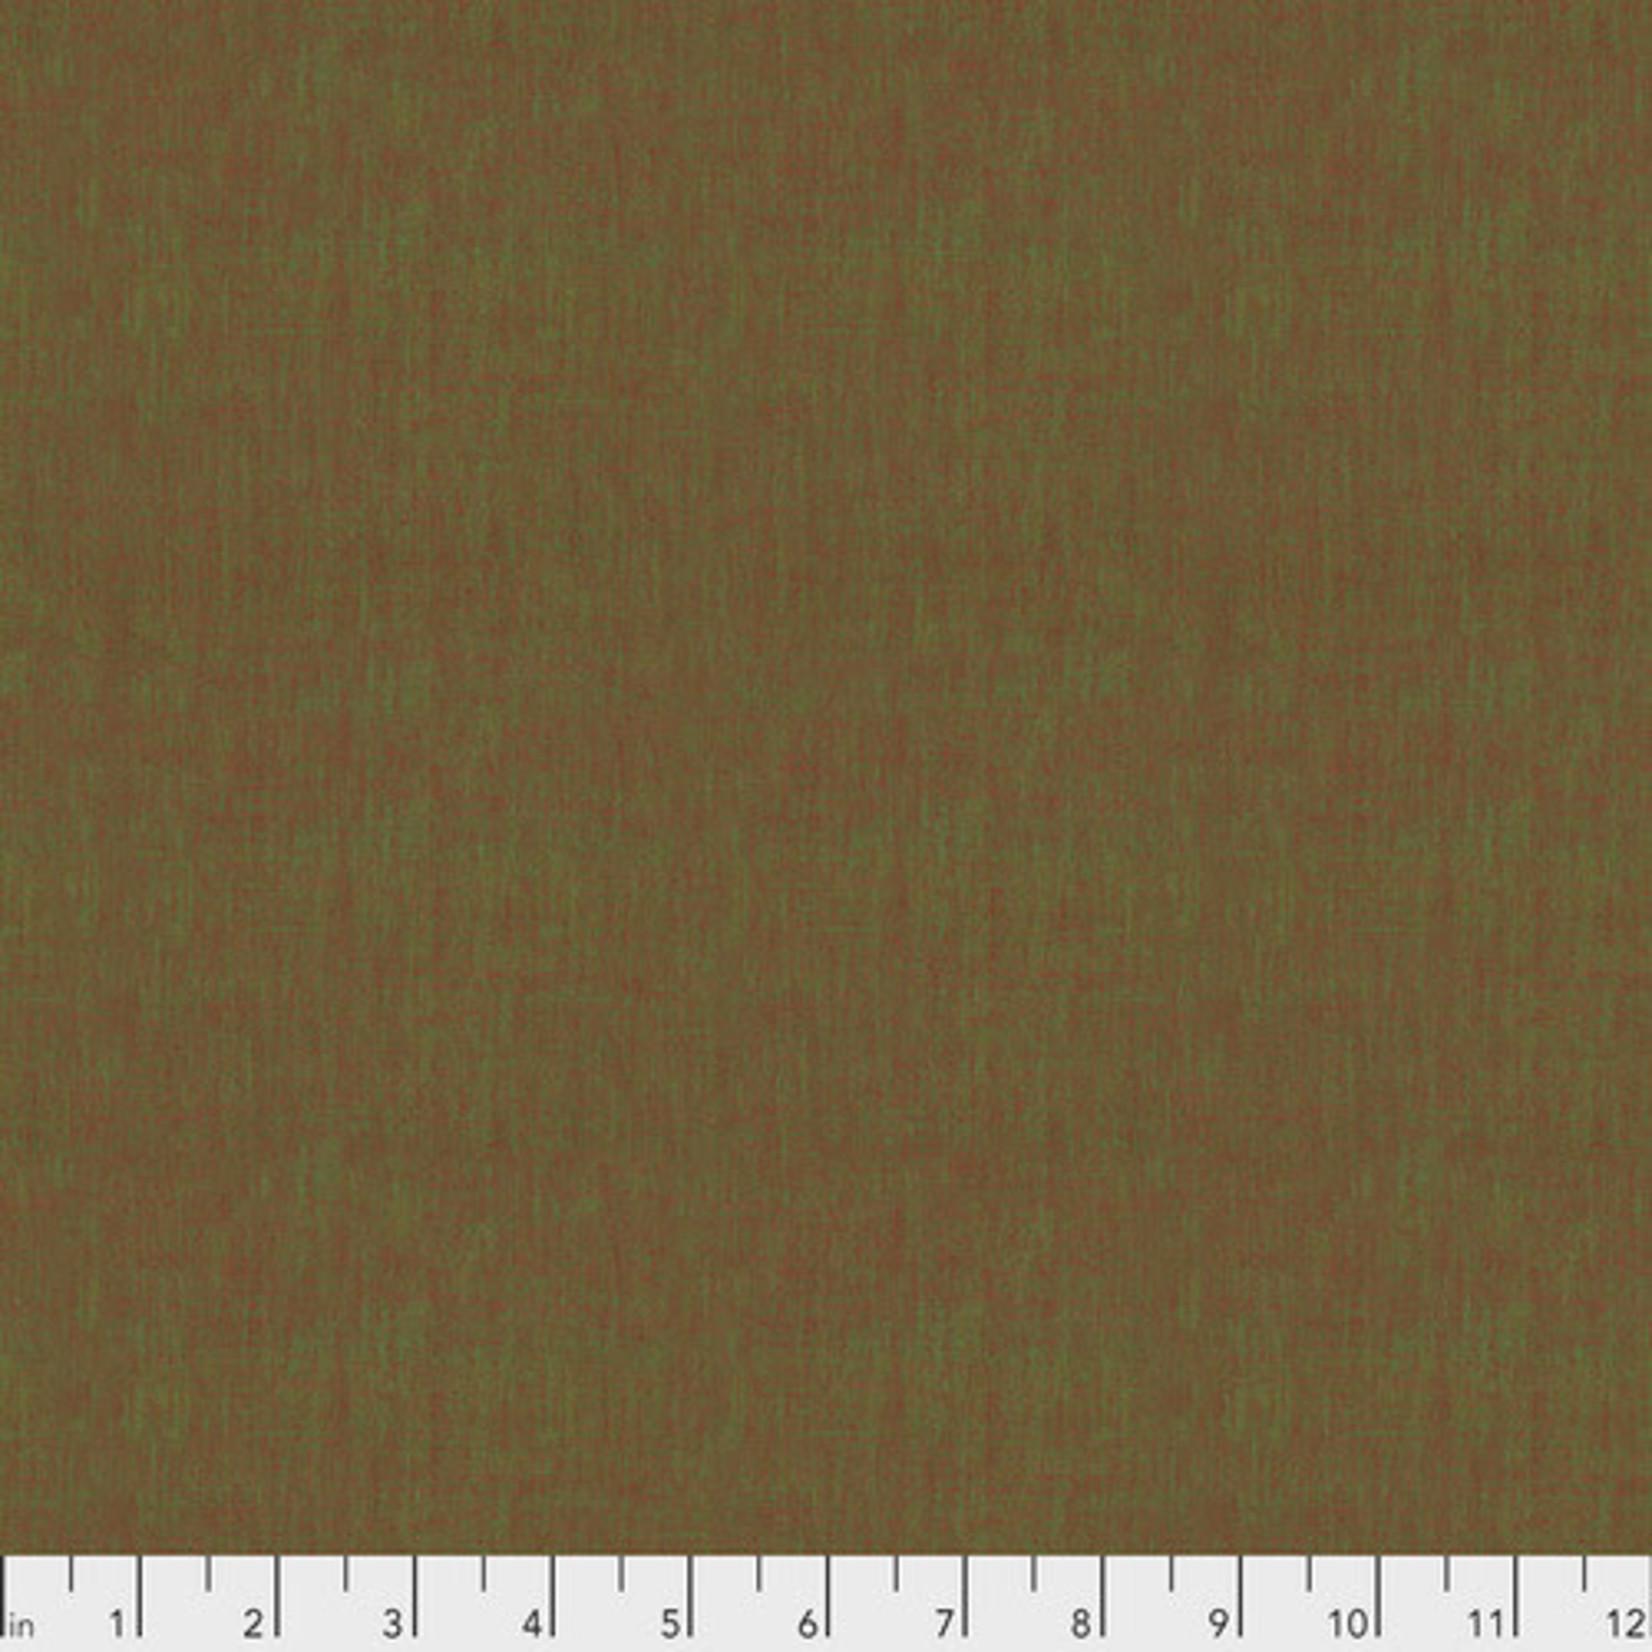 Kaffe Fassett KF Collective - Shot Cottons, Nutmeg (SCGP102.NUTMEG) $0.18 per cm or $18/m